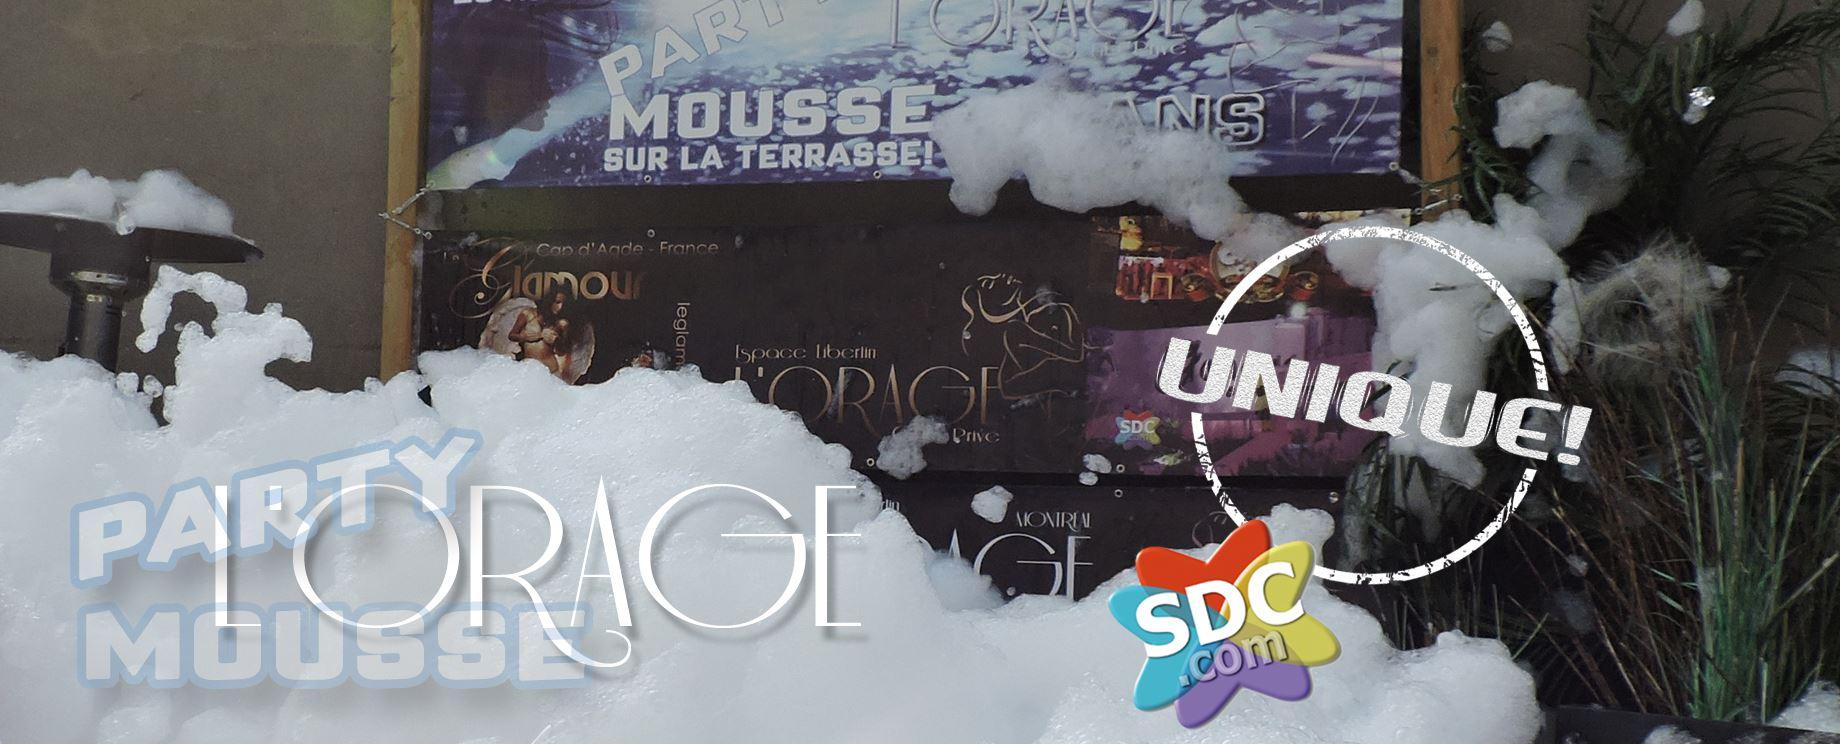 L'Orage Club Montreal Foam Party | Lexi Sylver